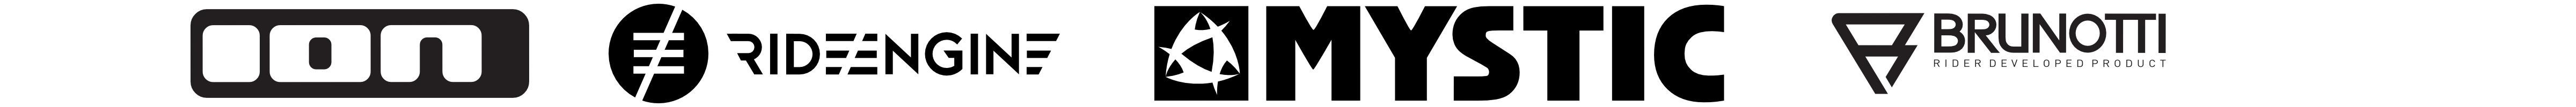 LogoLitesTrapeze